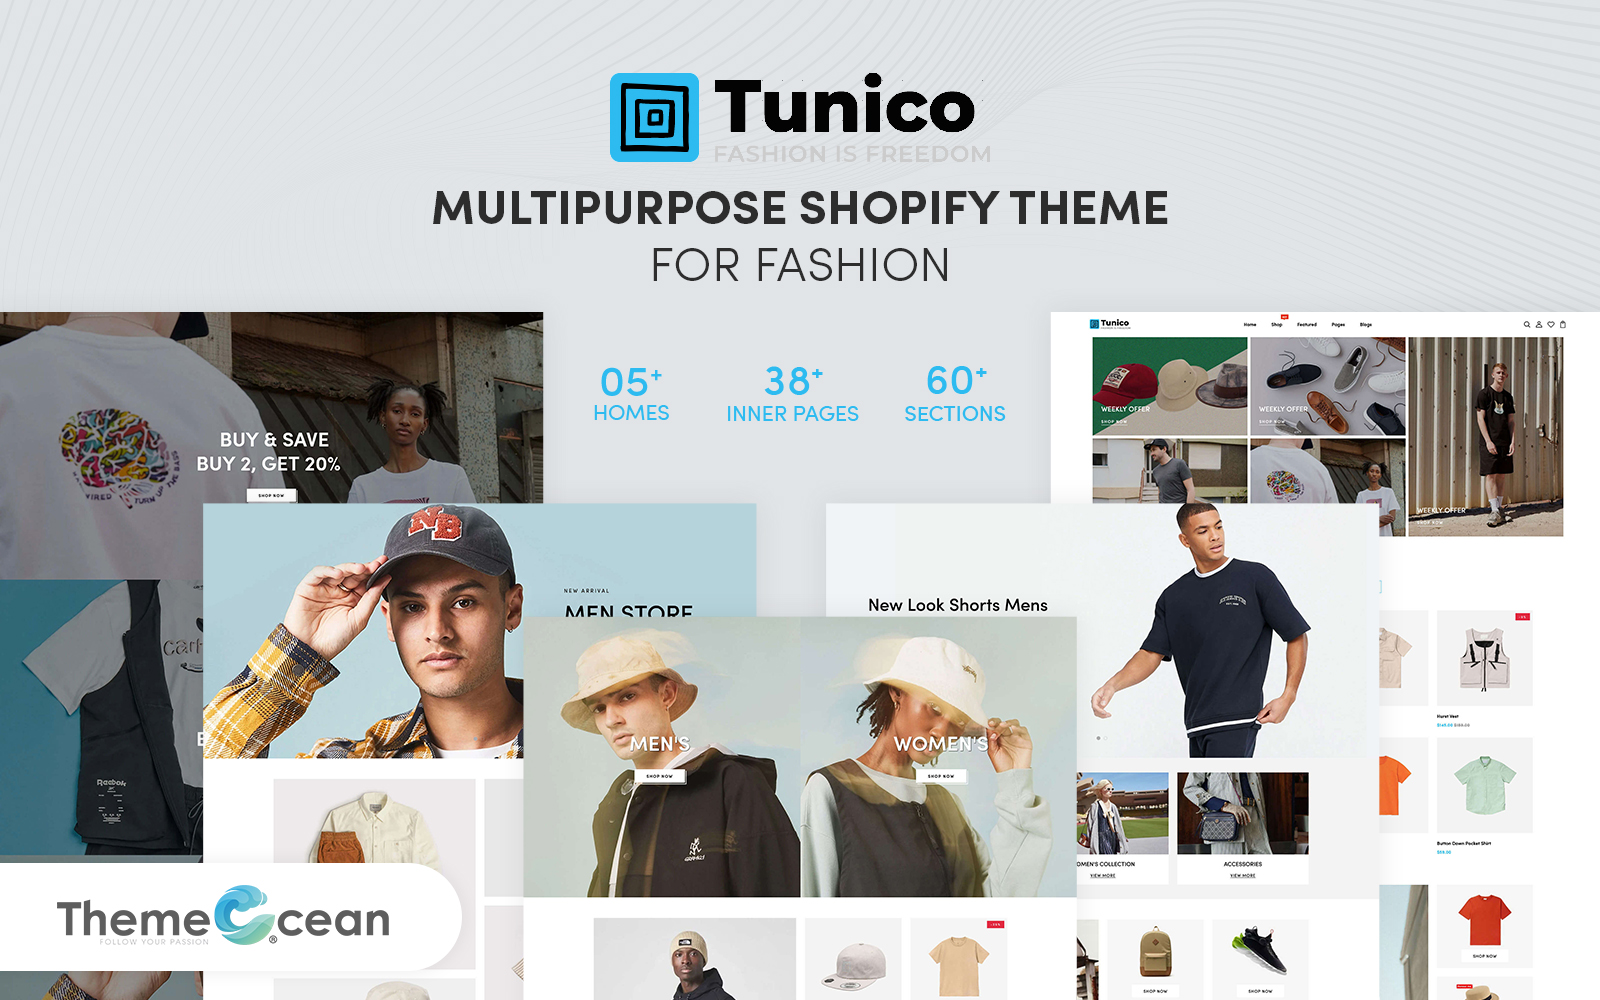 Tunico - Multipurpose Shopify Theme for Fashion